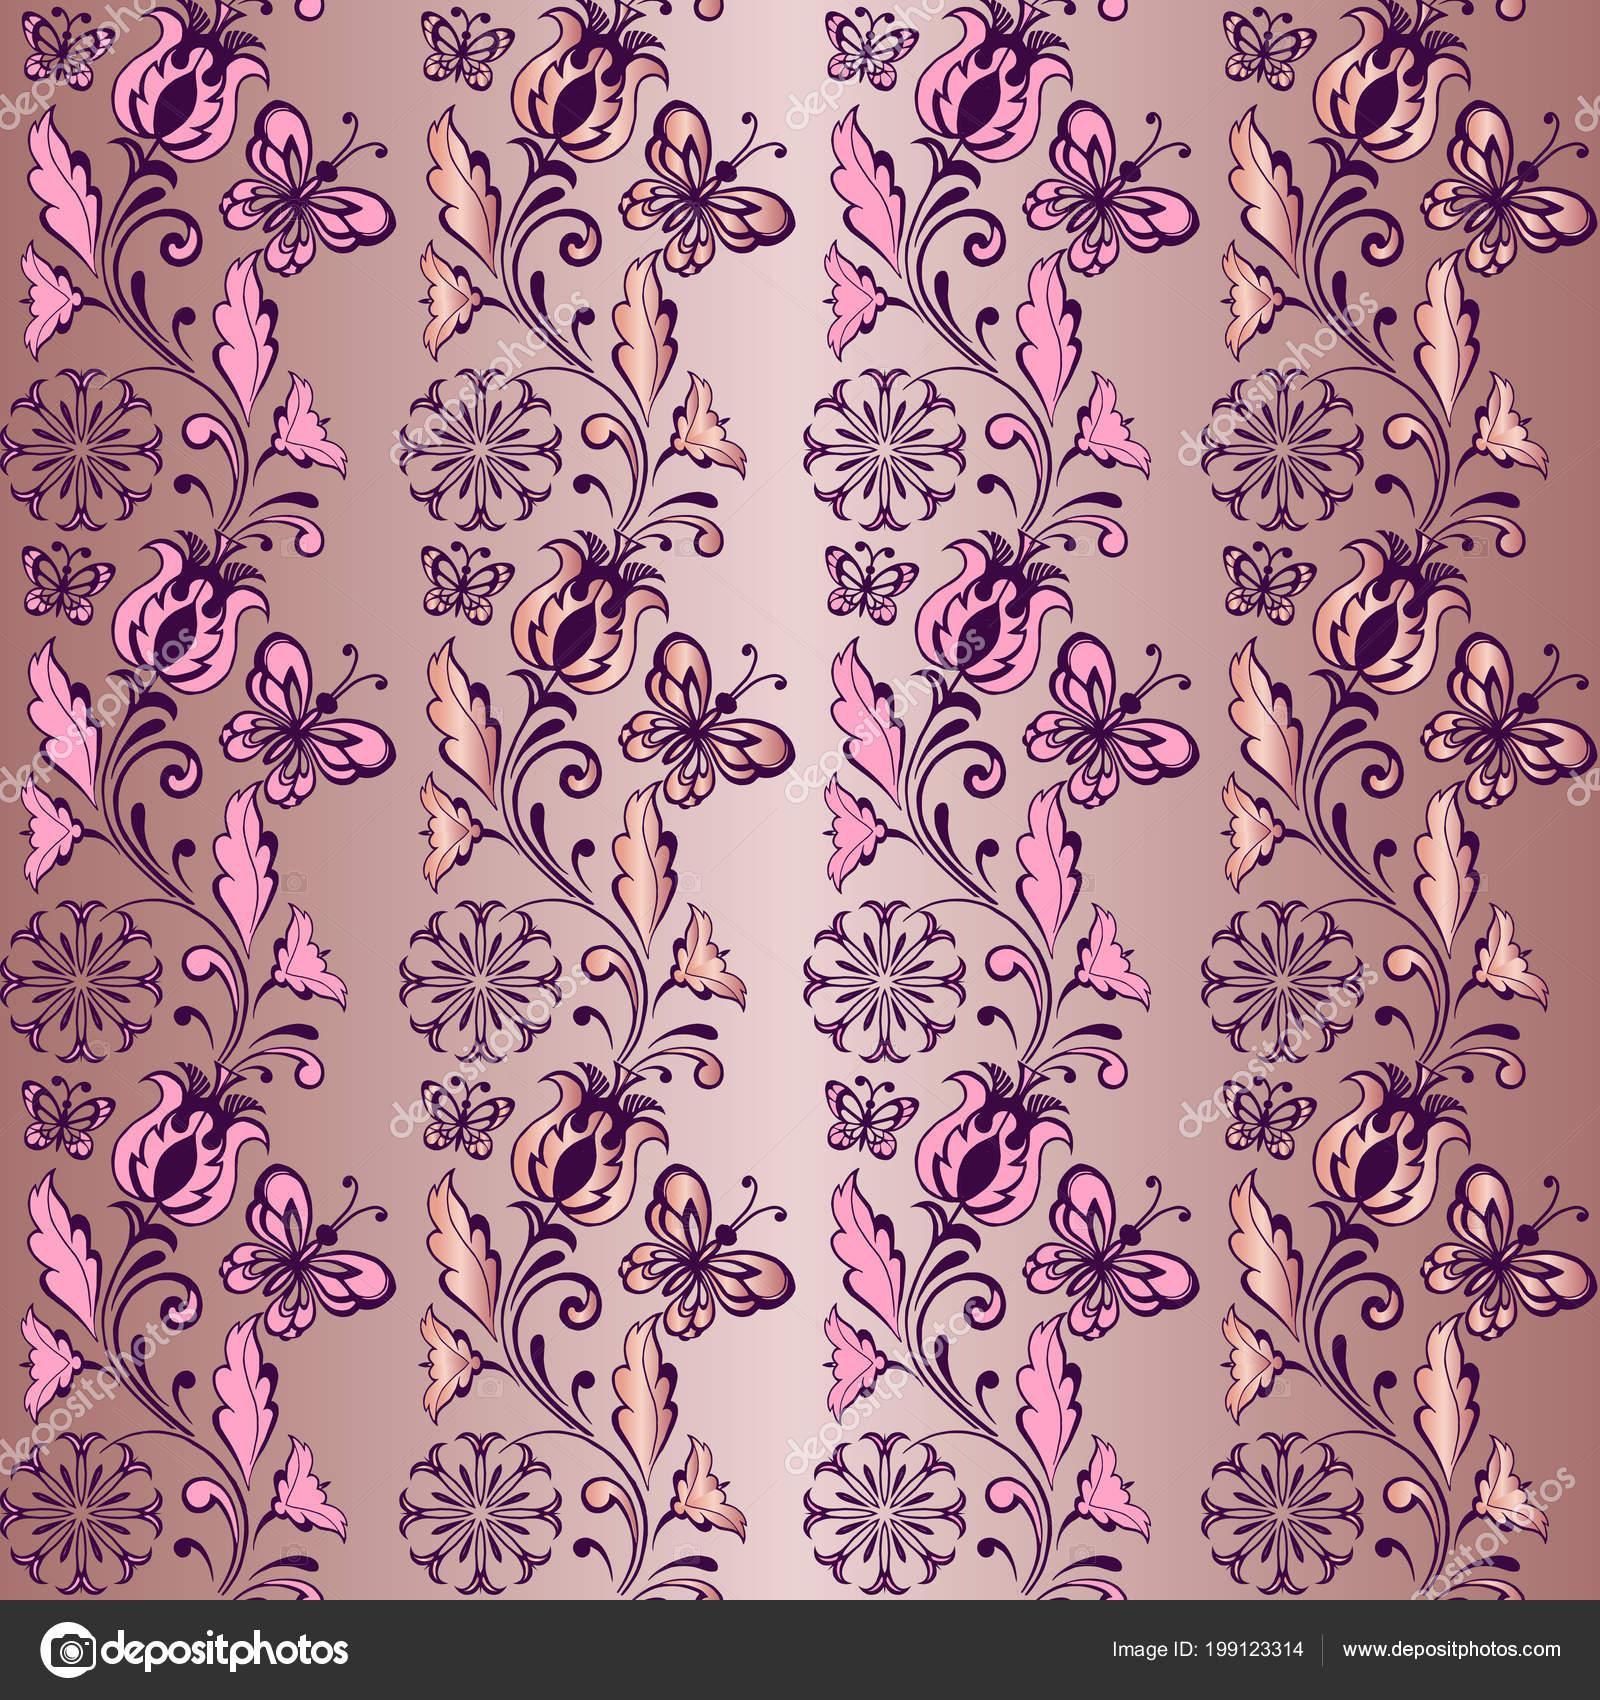 Striped Floral Seamless Pattern Butterflies Pink Decorative